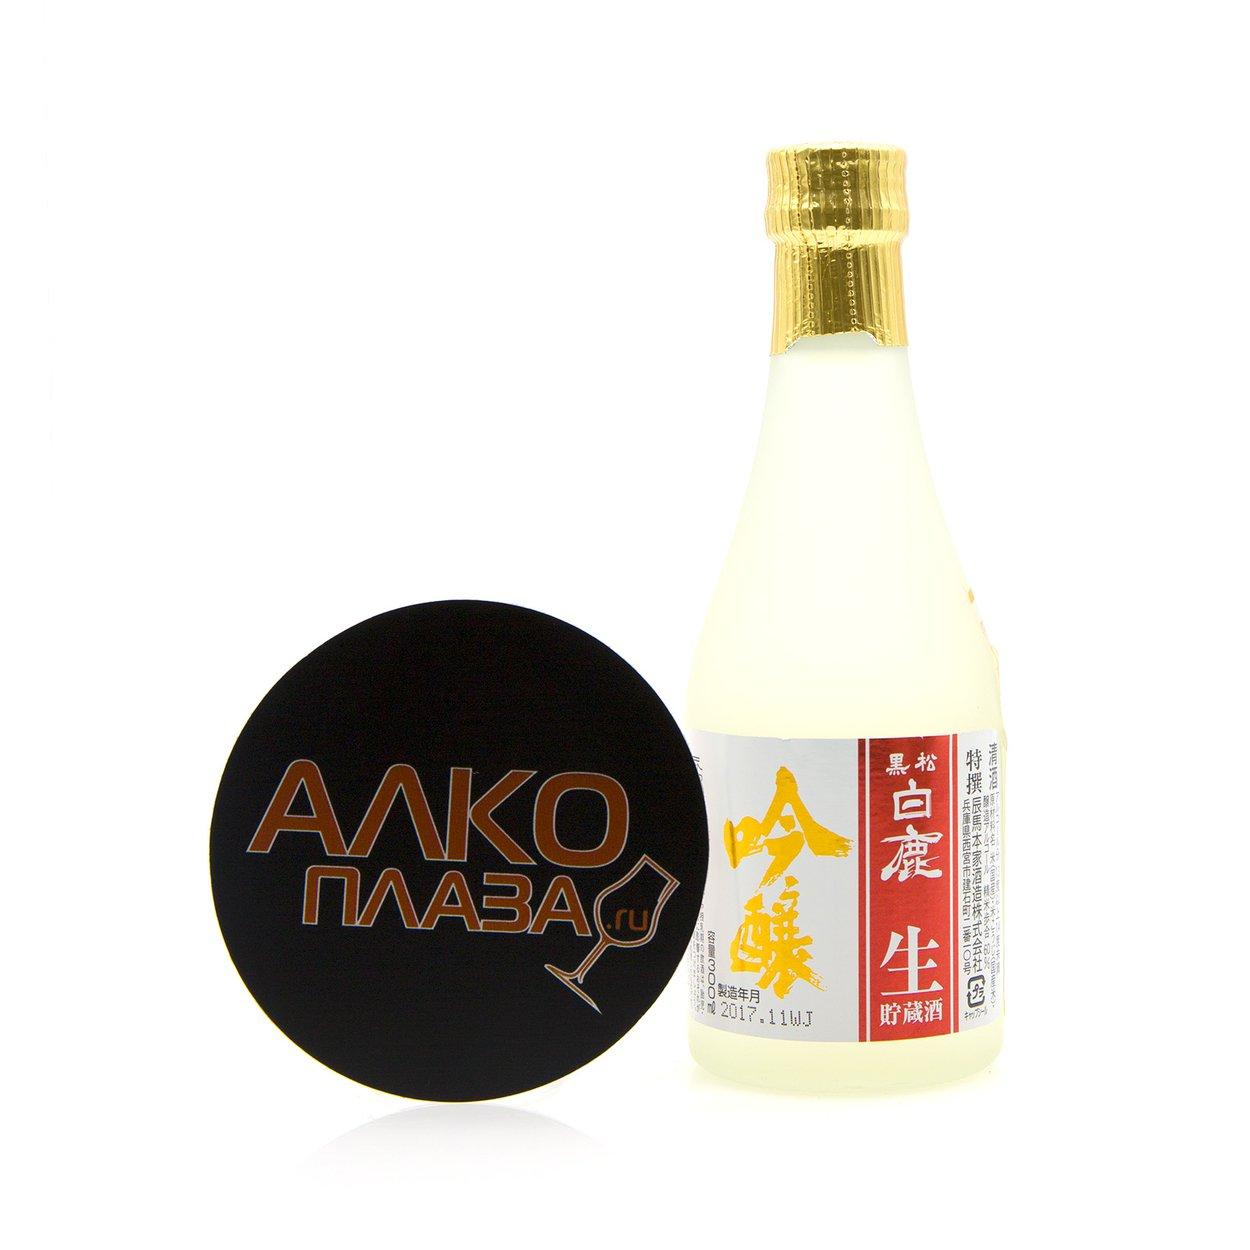 Sake Hakushika Ginjo Namachozo 0,3l сакэ Хакусика Гиндзё Намачодзо 0,3л